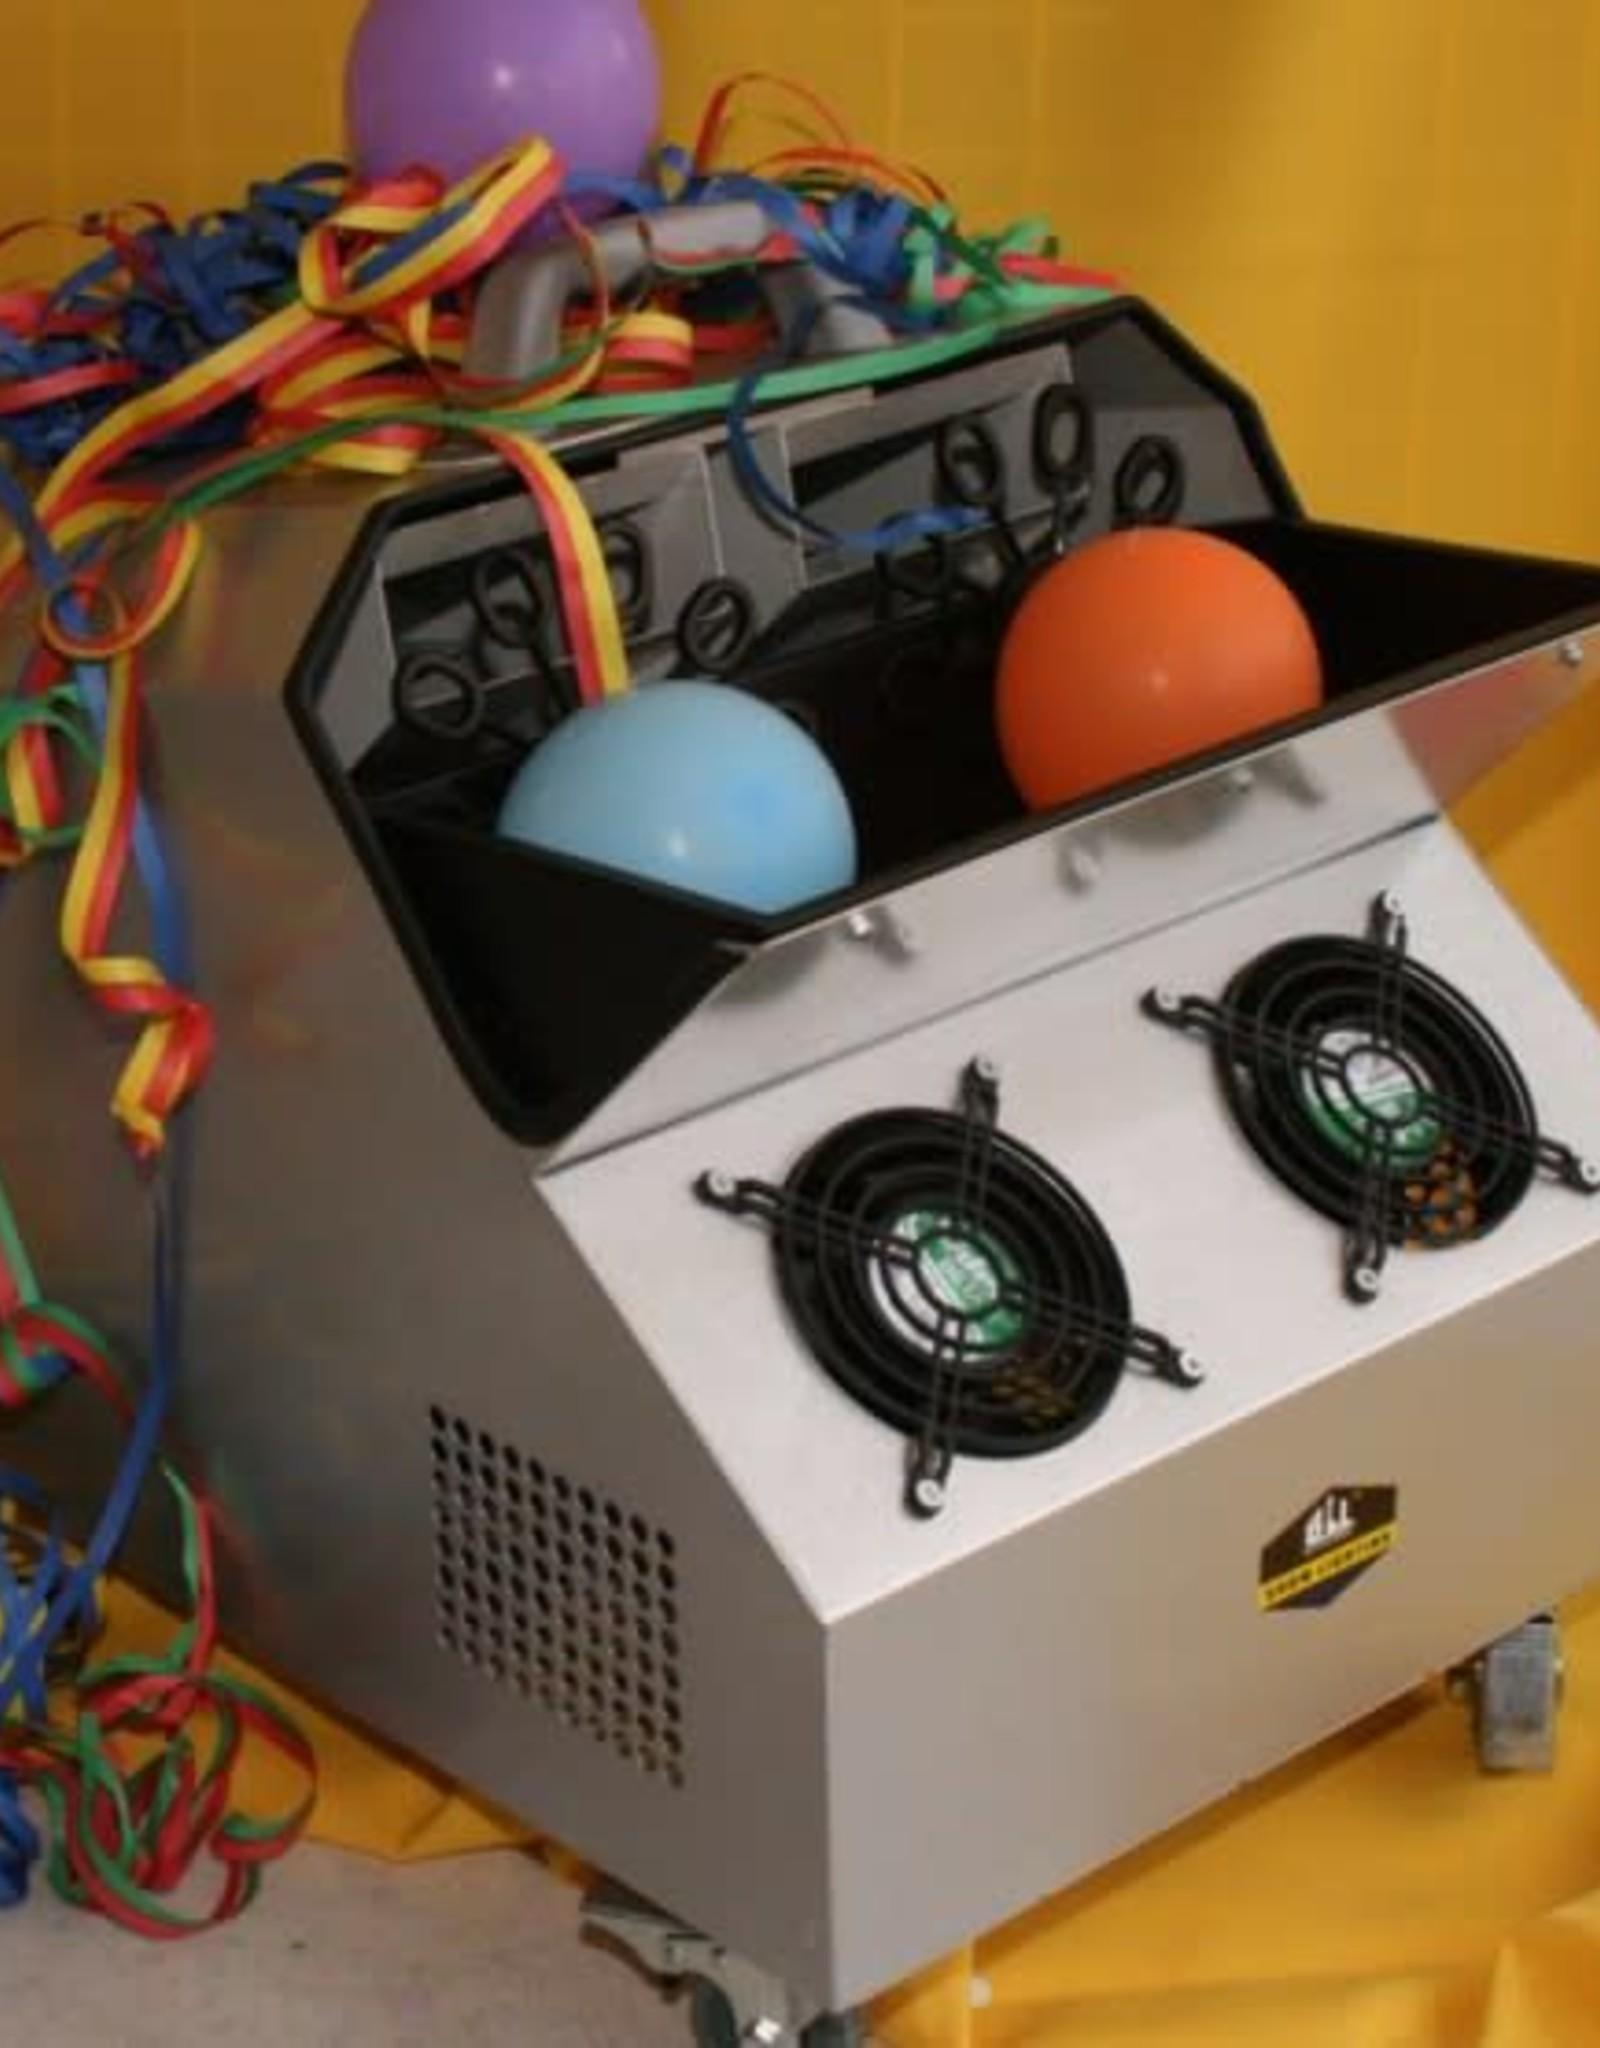 zeepbellenmachine